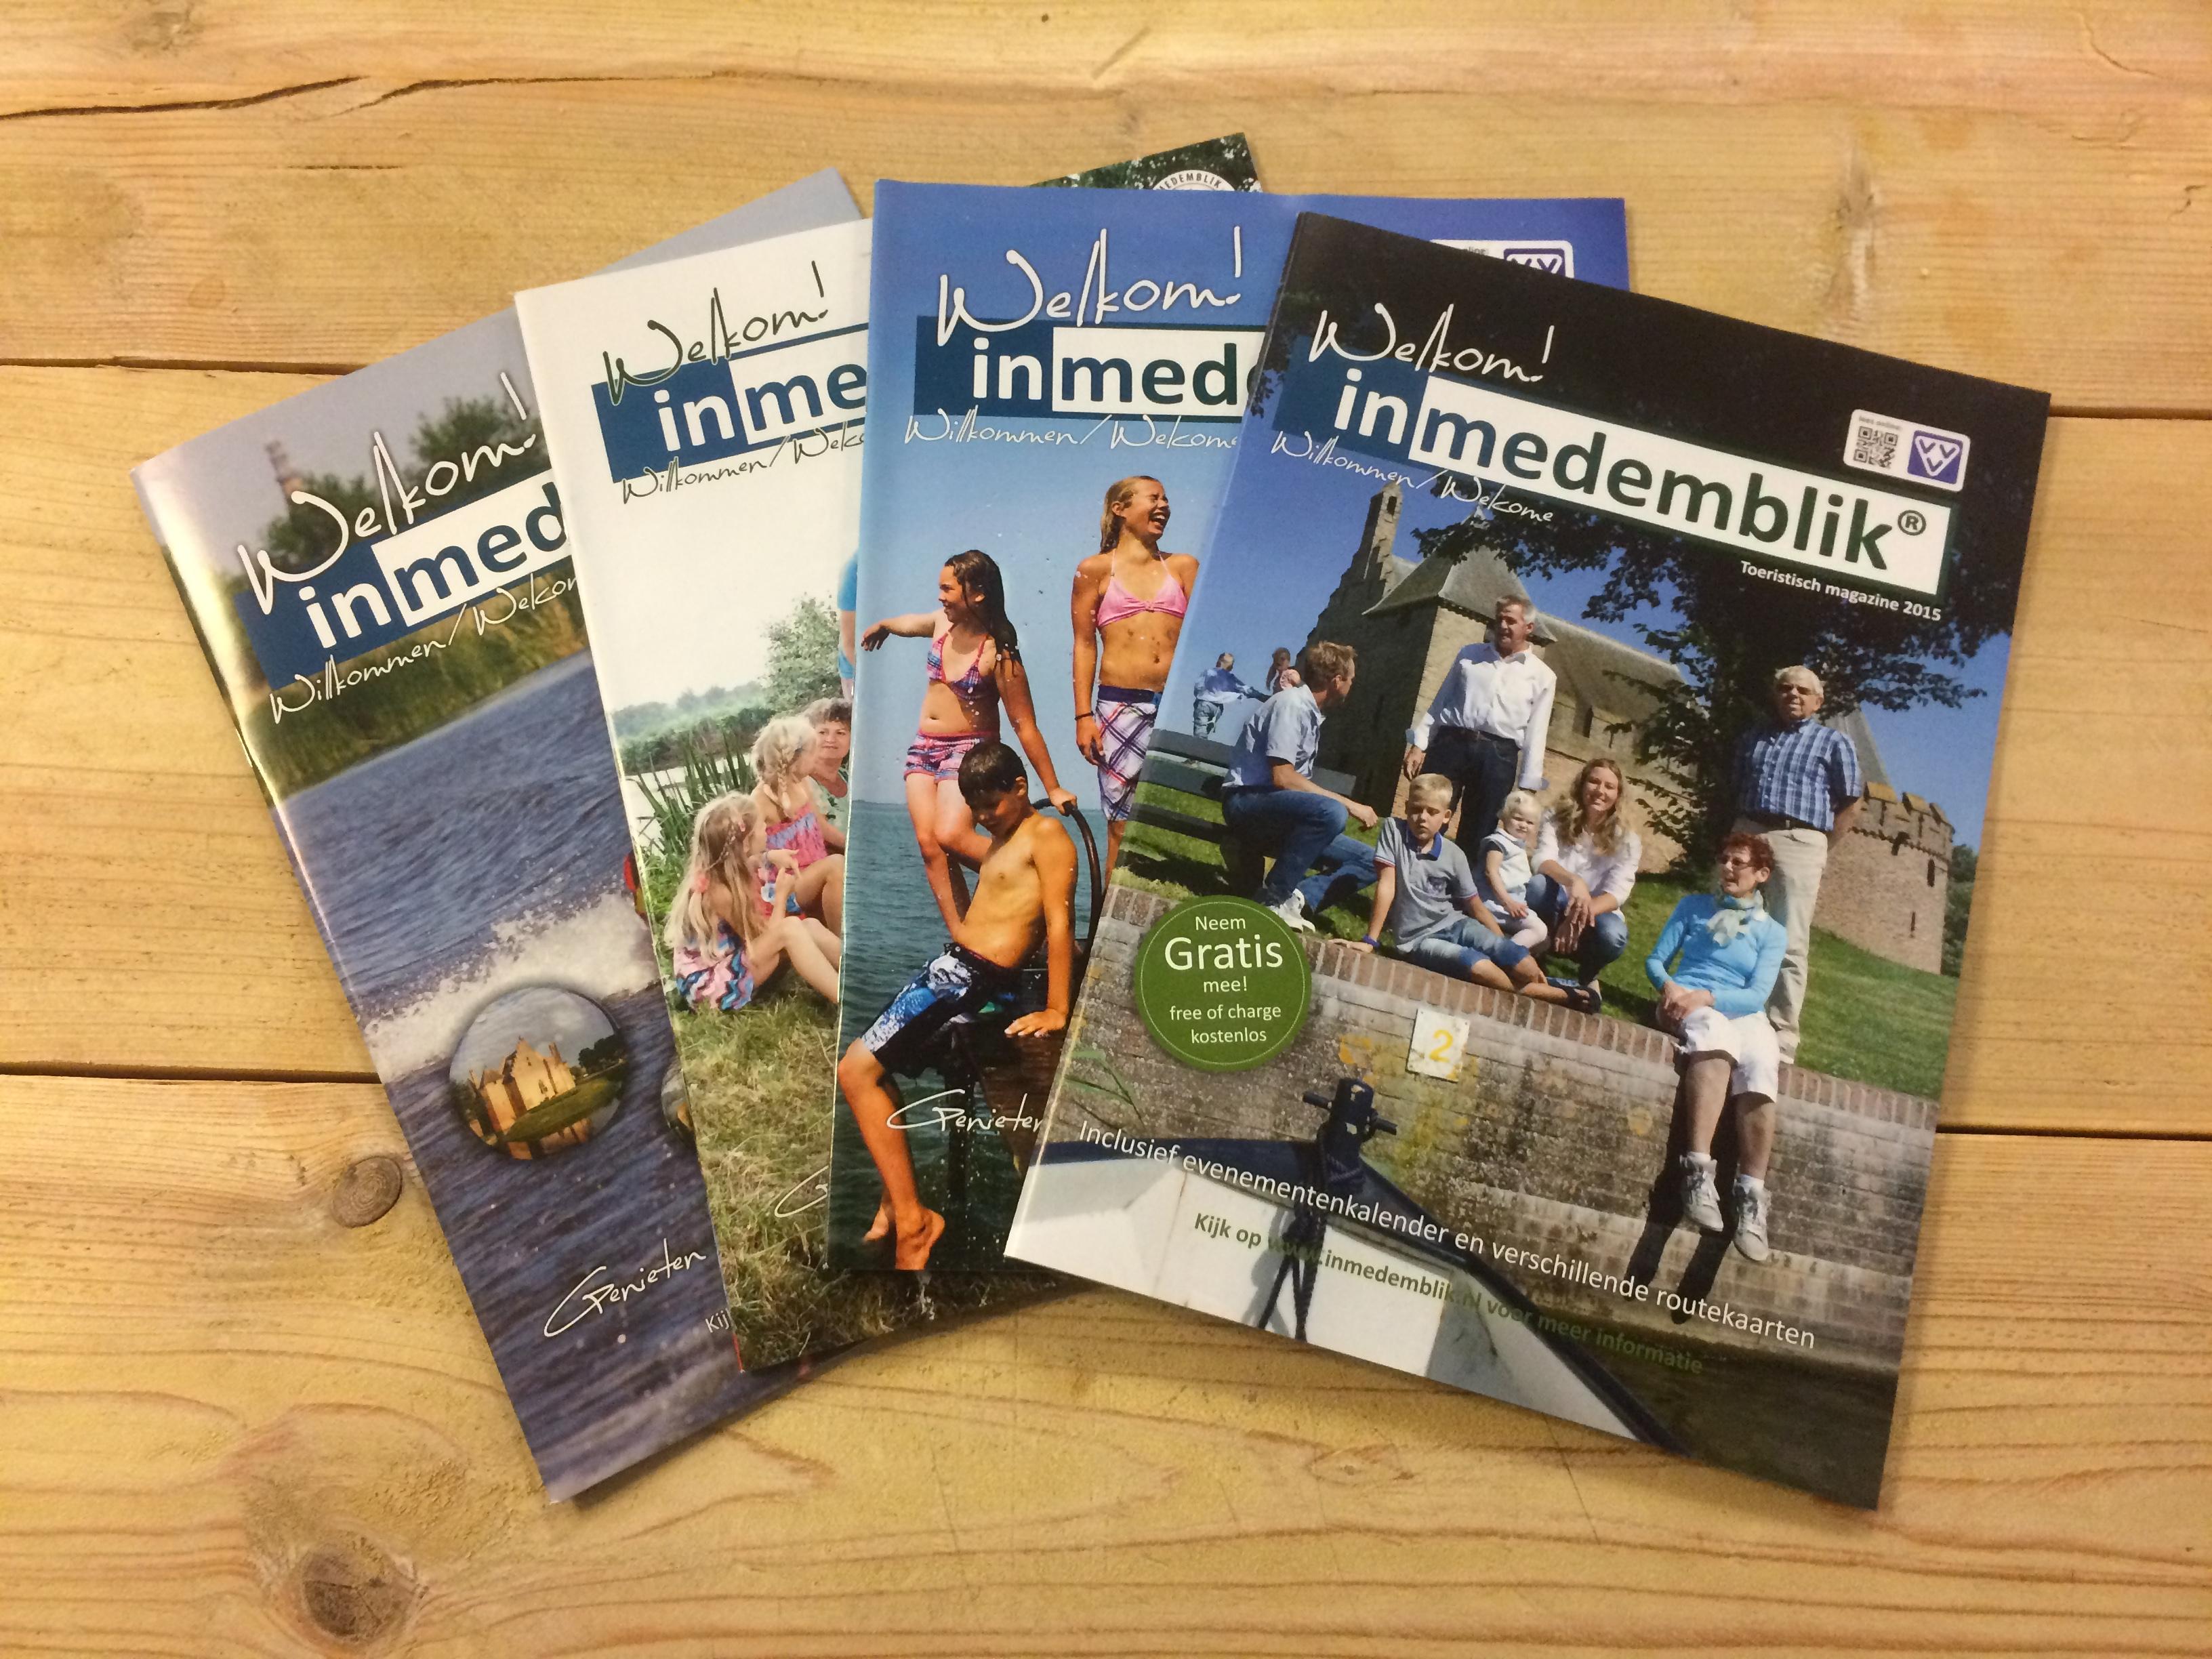 Inmedemblik Magazine